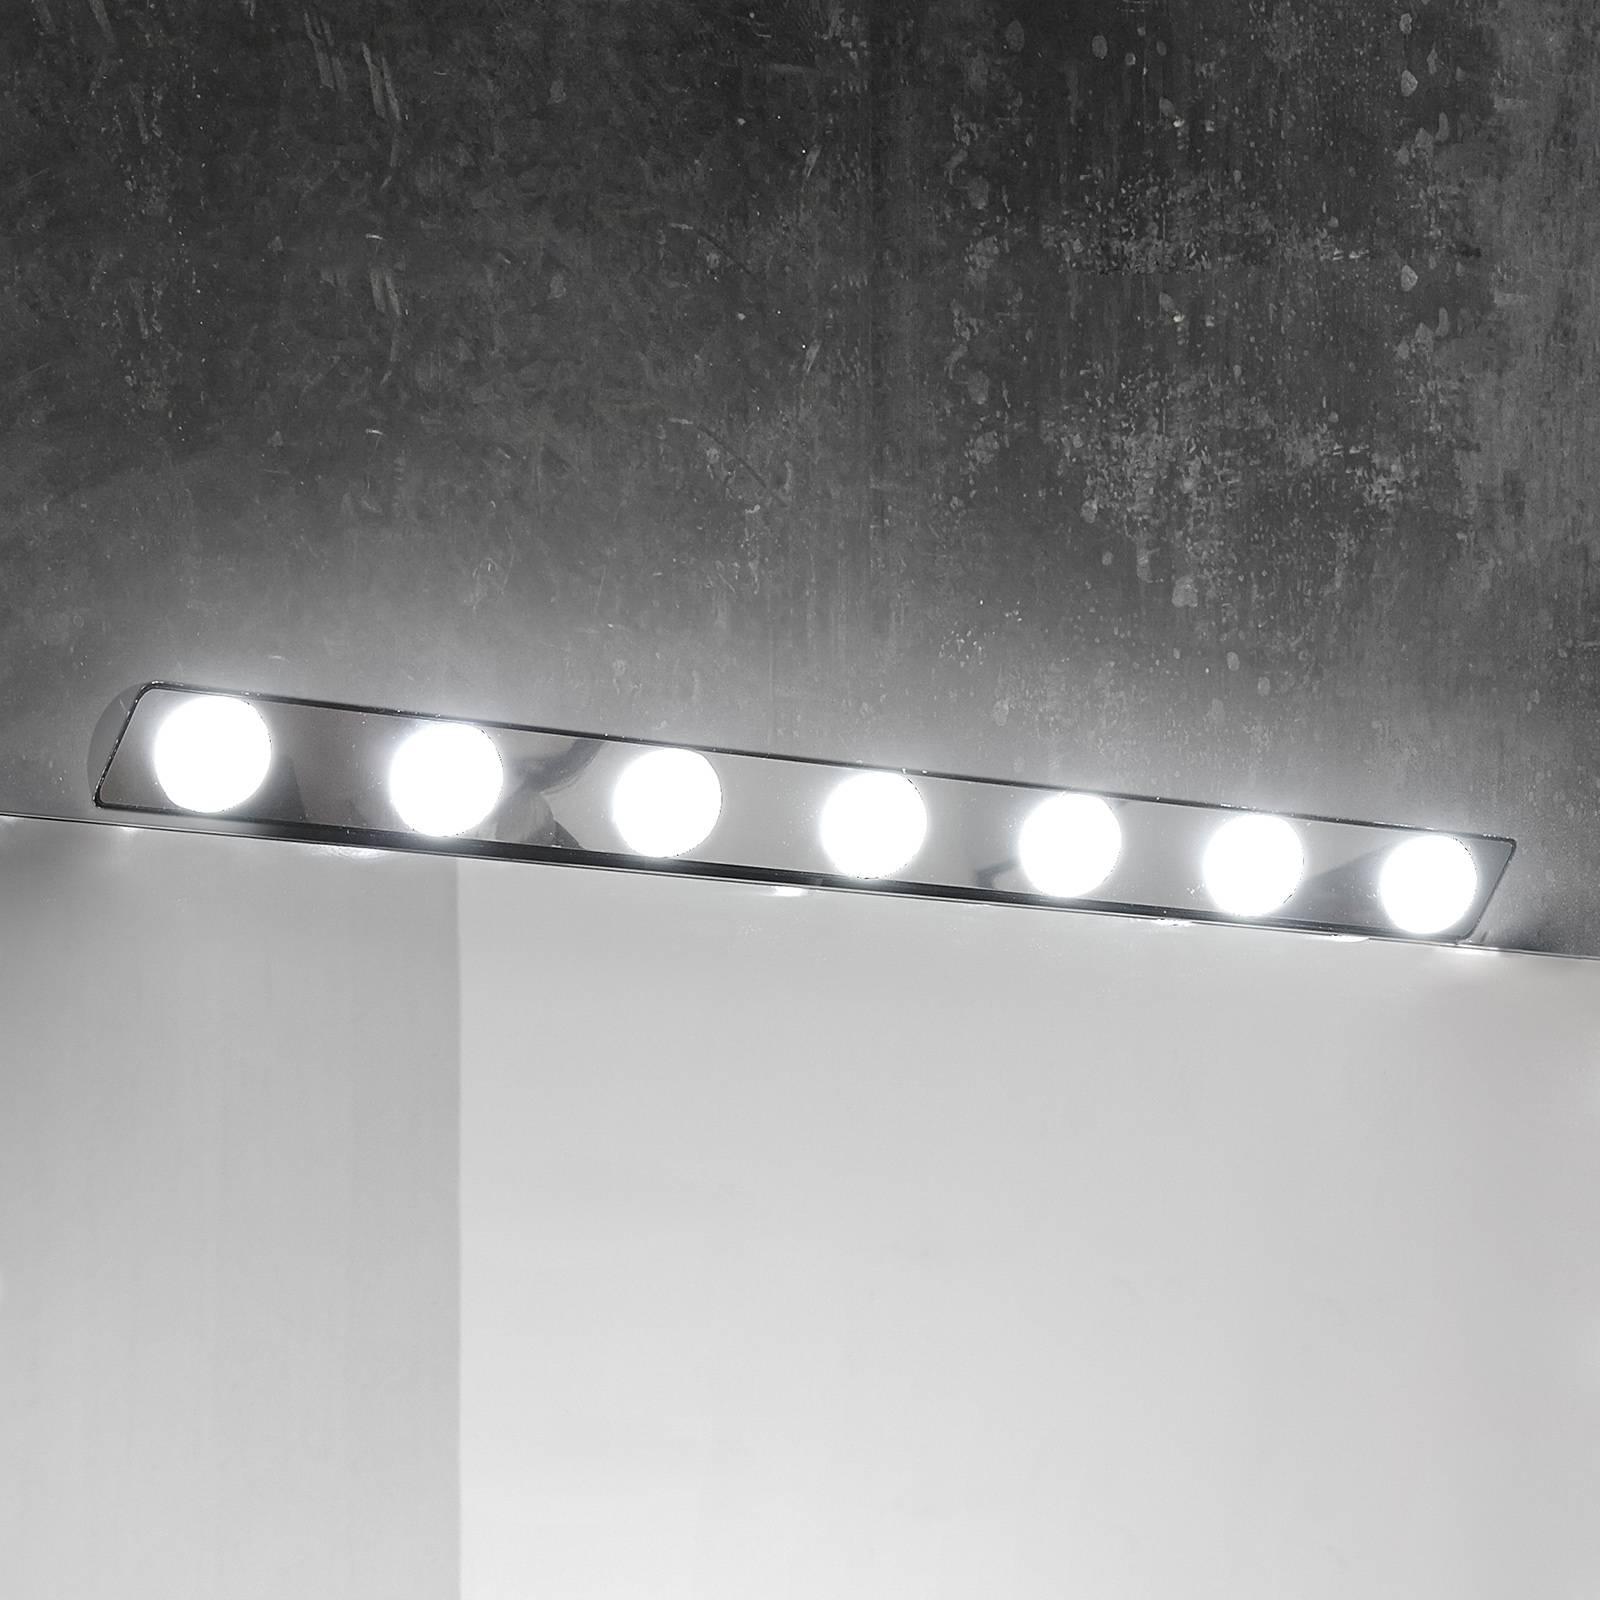 Hollywood-LED-peilivalaisin, 85 cm 7-lamppuinen